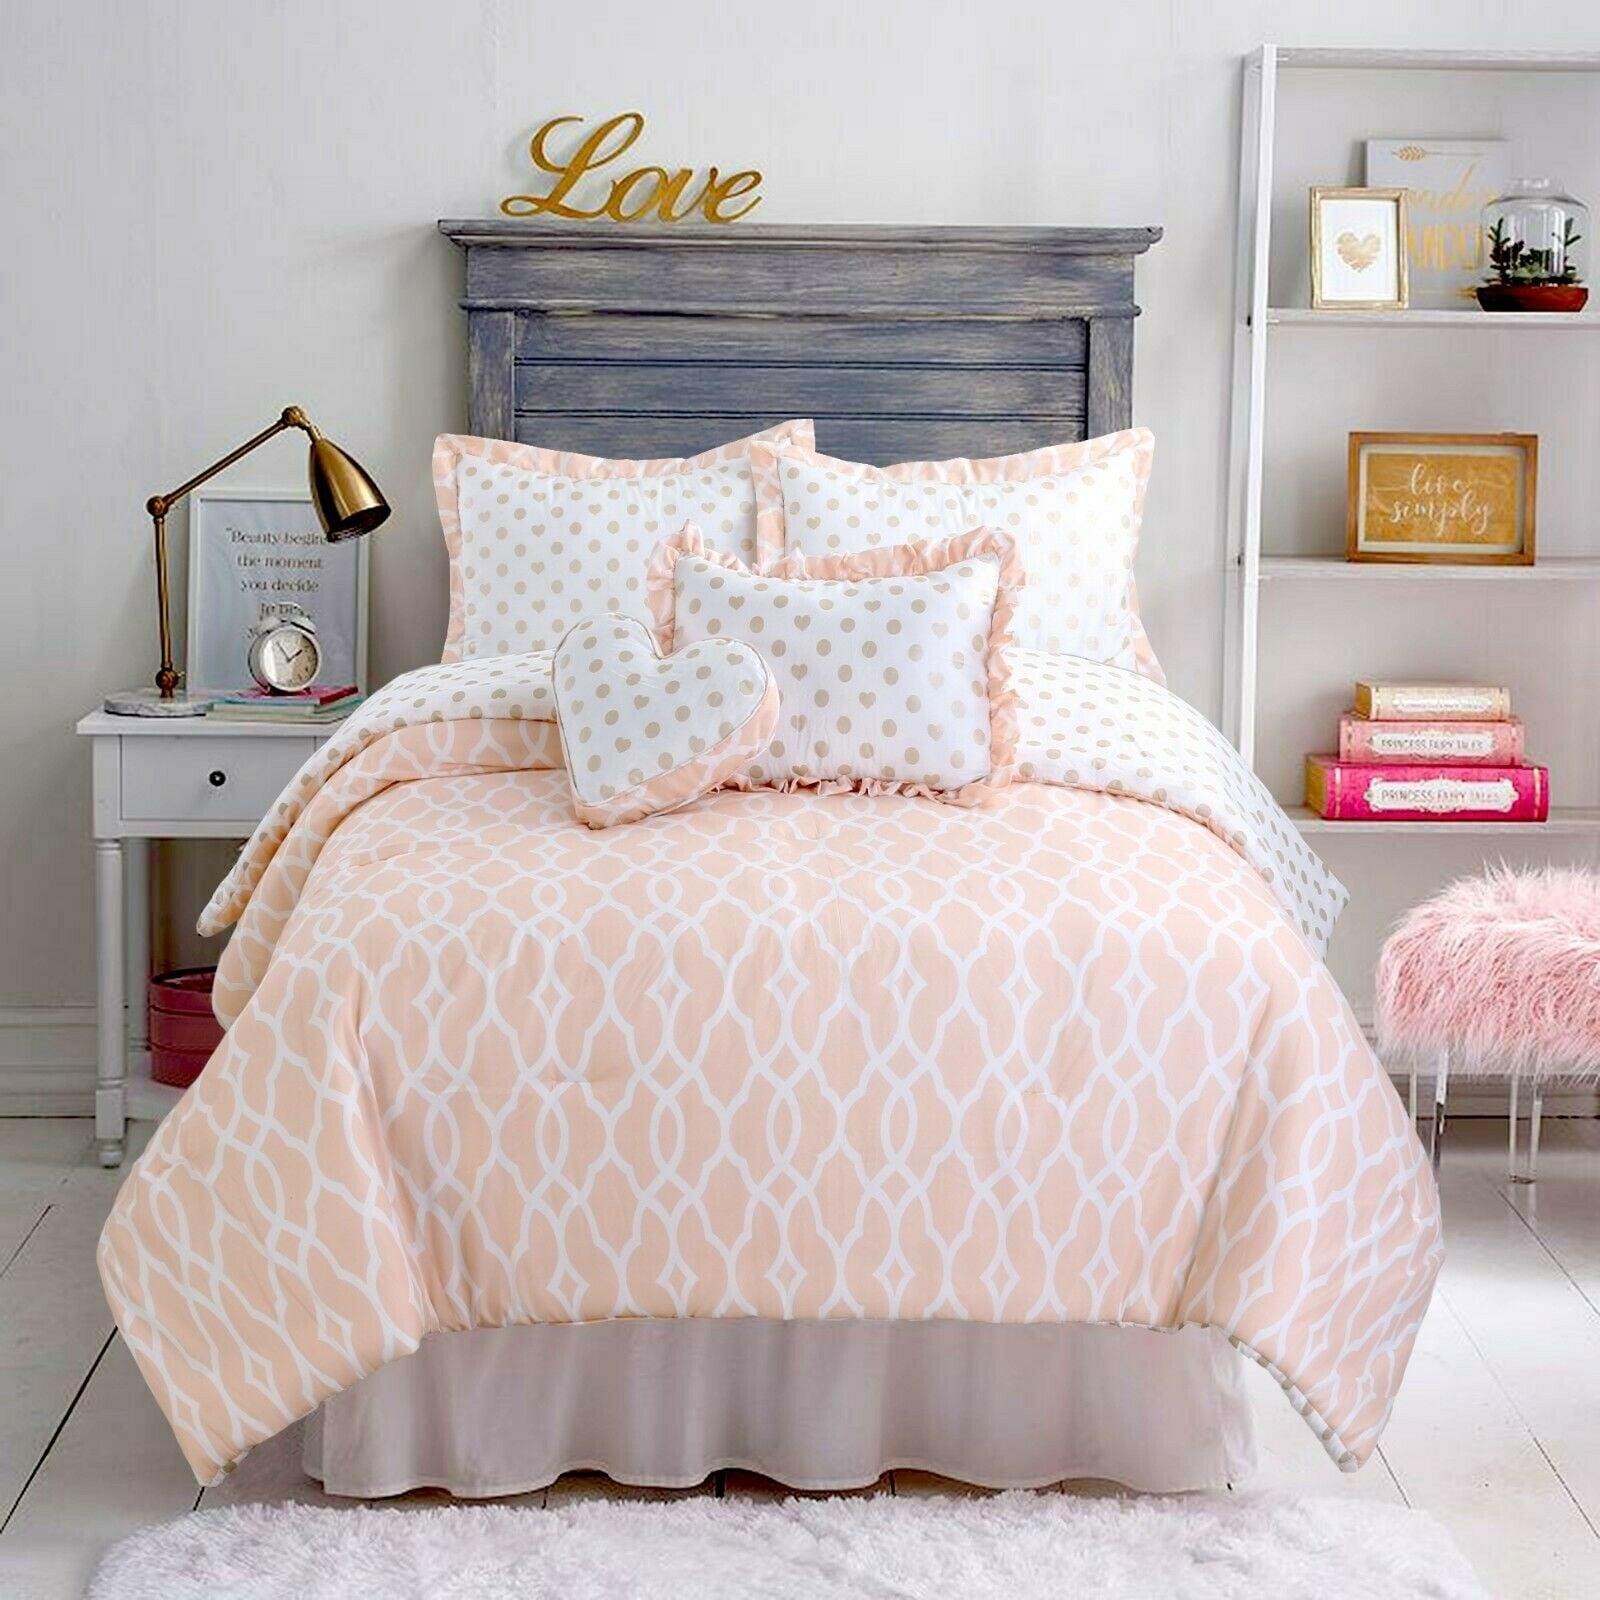 Cozy Line Peach Heart Polka Dot Reversible Comforter Set On Sale Overstock 31905098